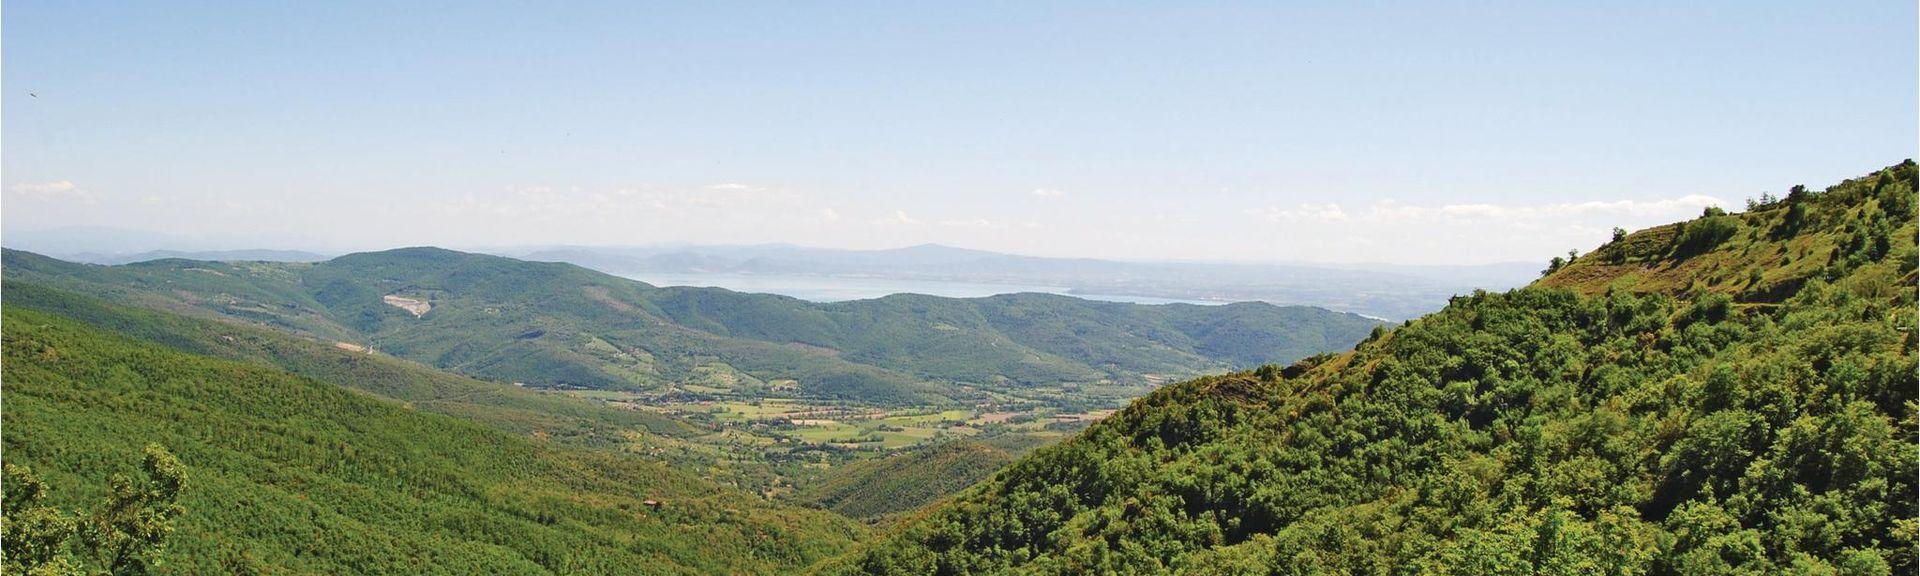 Umbertide PG, Italy